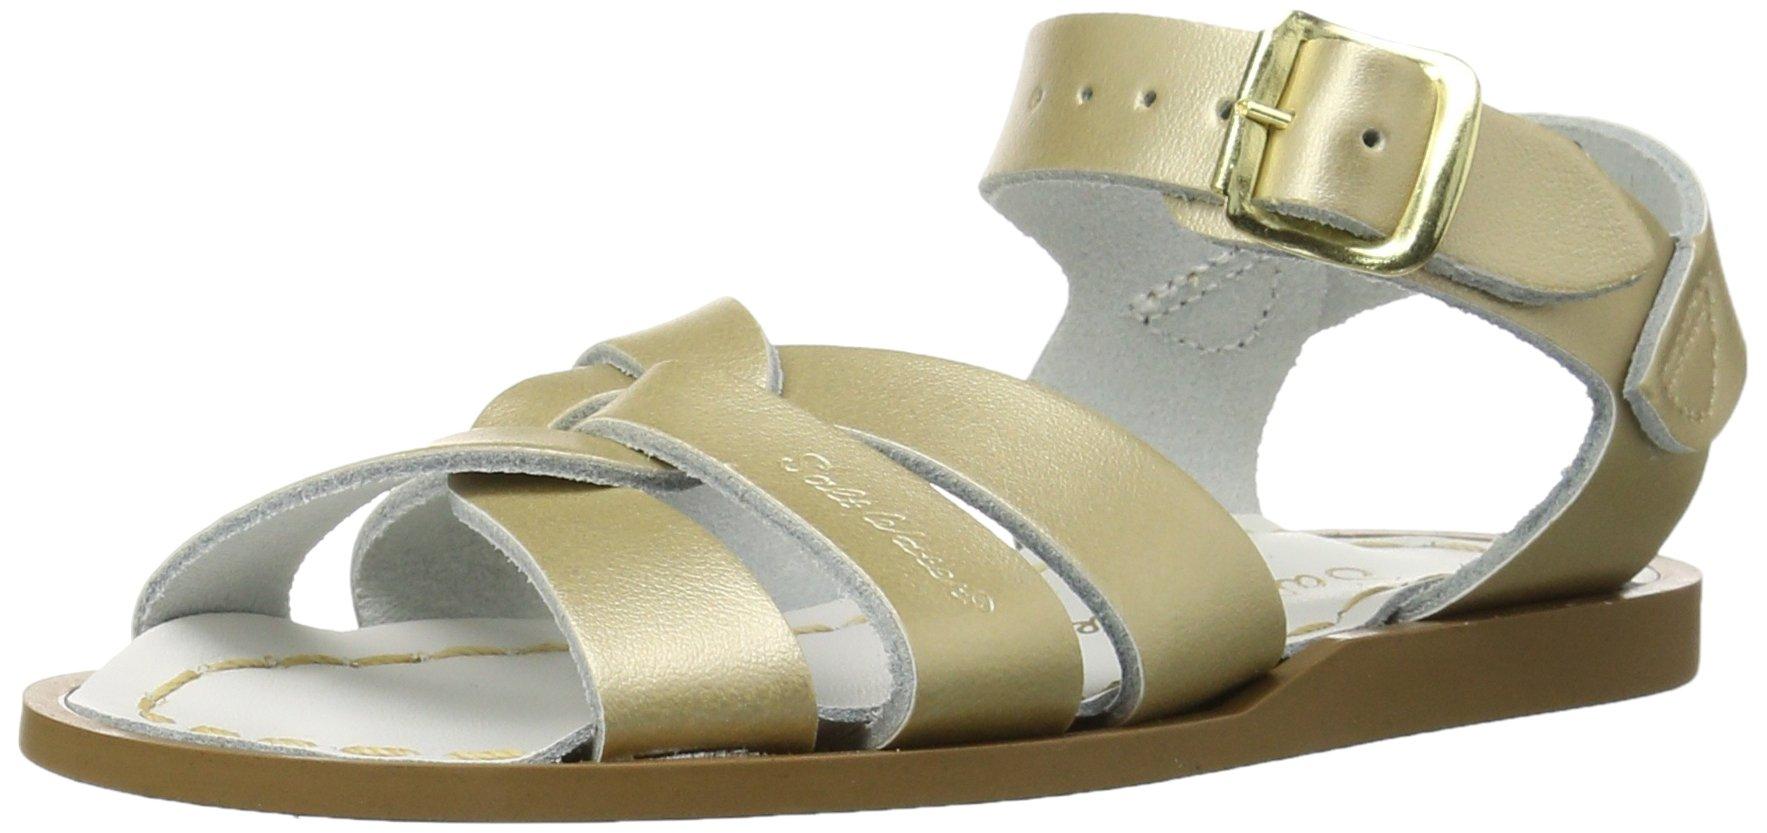 Salt Water Sandals by Hoy Shoe Original Sandal (Toddler/Little Kid/Big Kid/Women's), Gold, 11 M US Little Kid